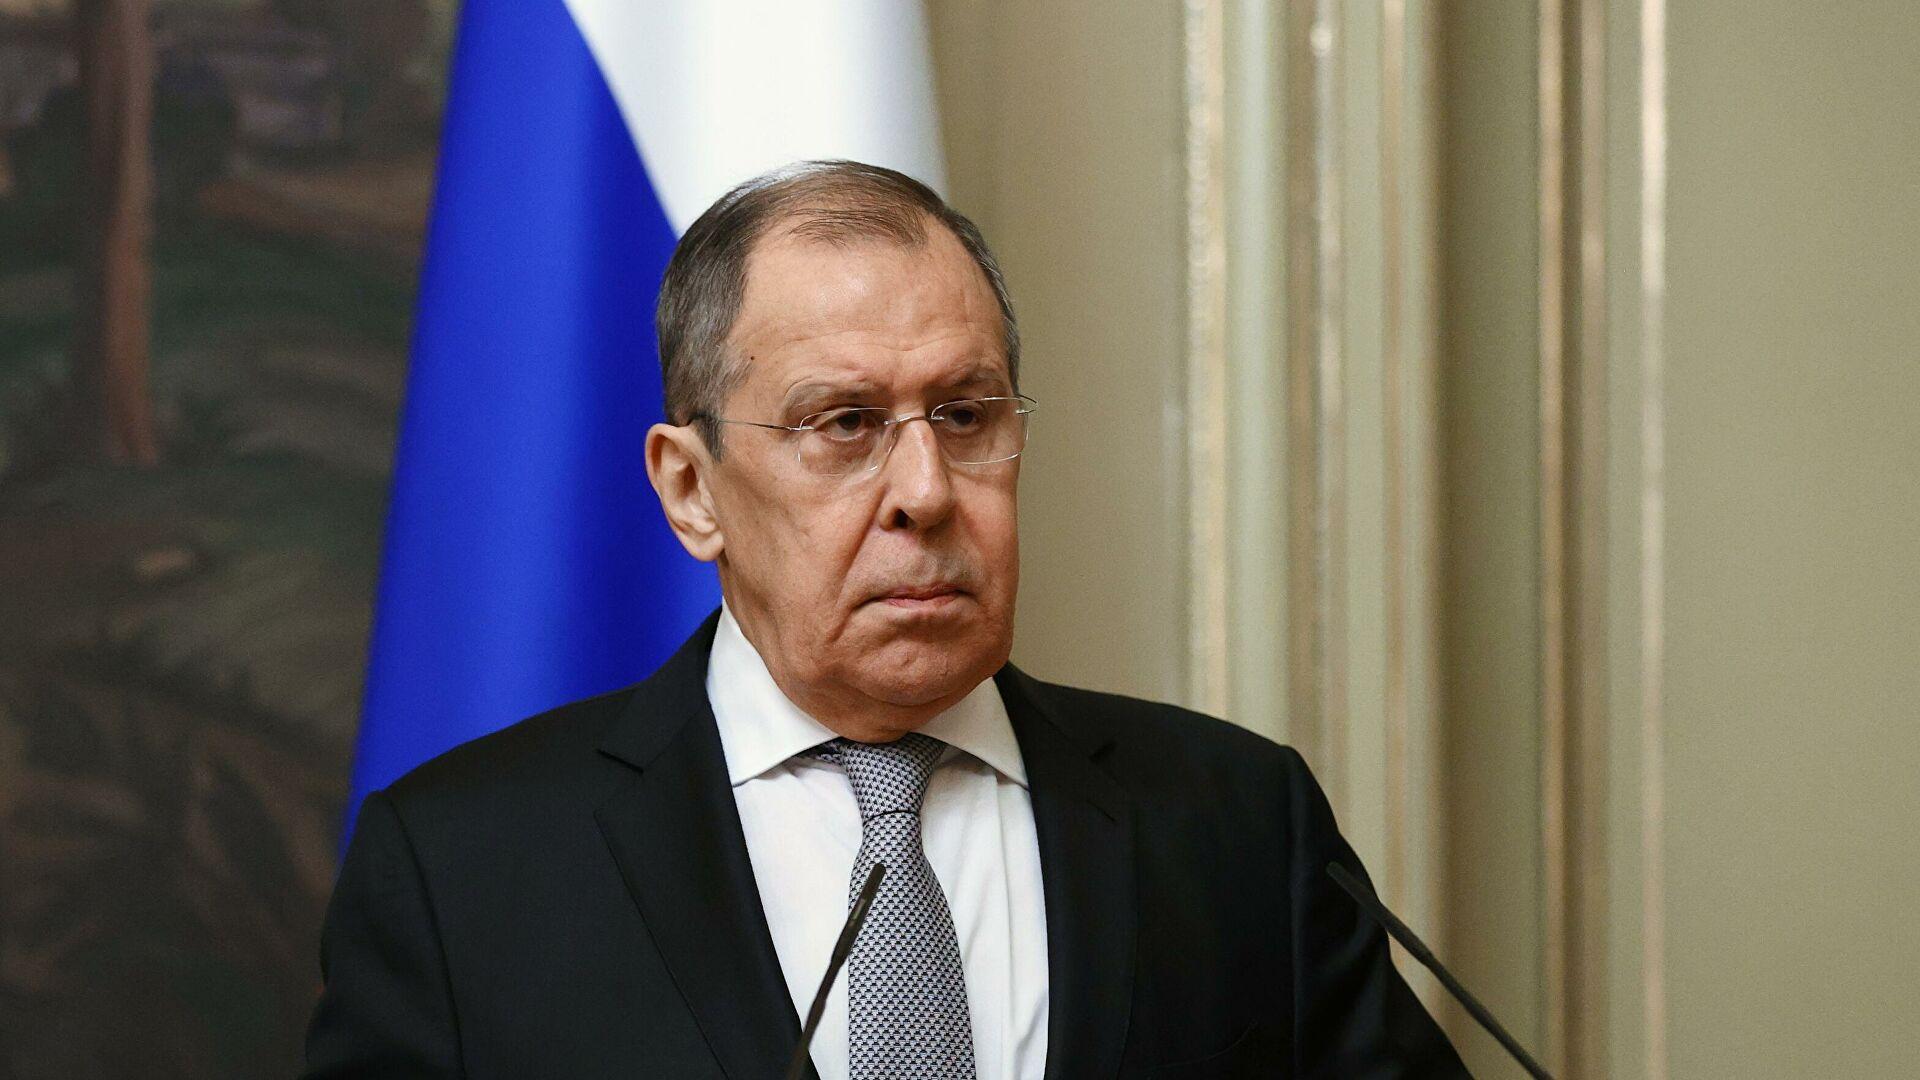 Lavrov: Potrebno zaustaviti pokušaje slabljenja sistema kontrole nad naoružanjem